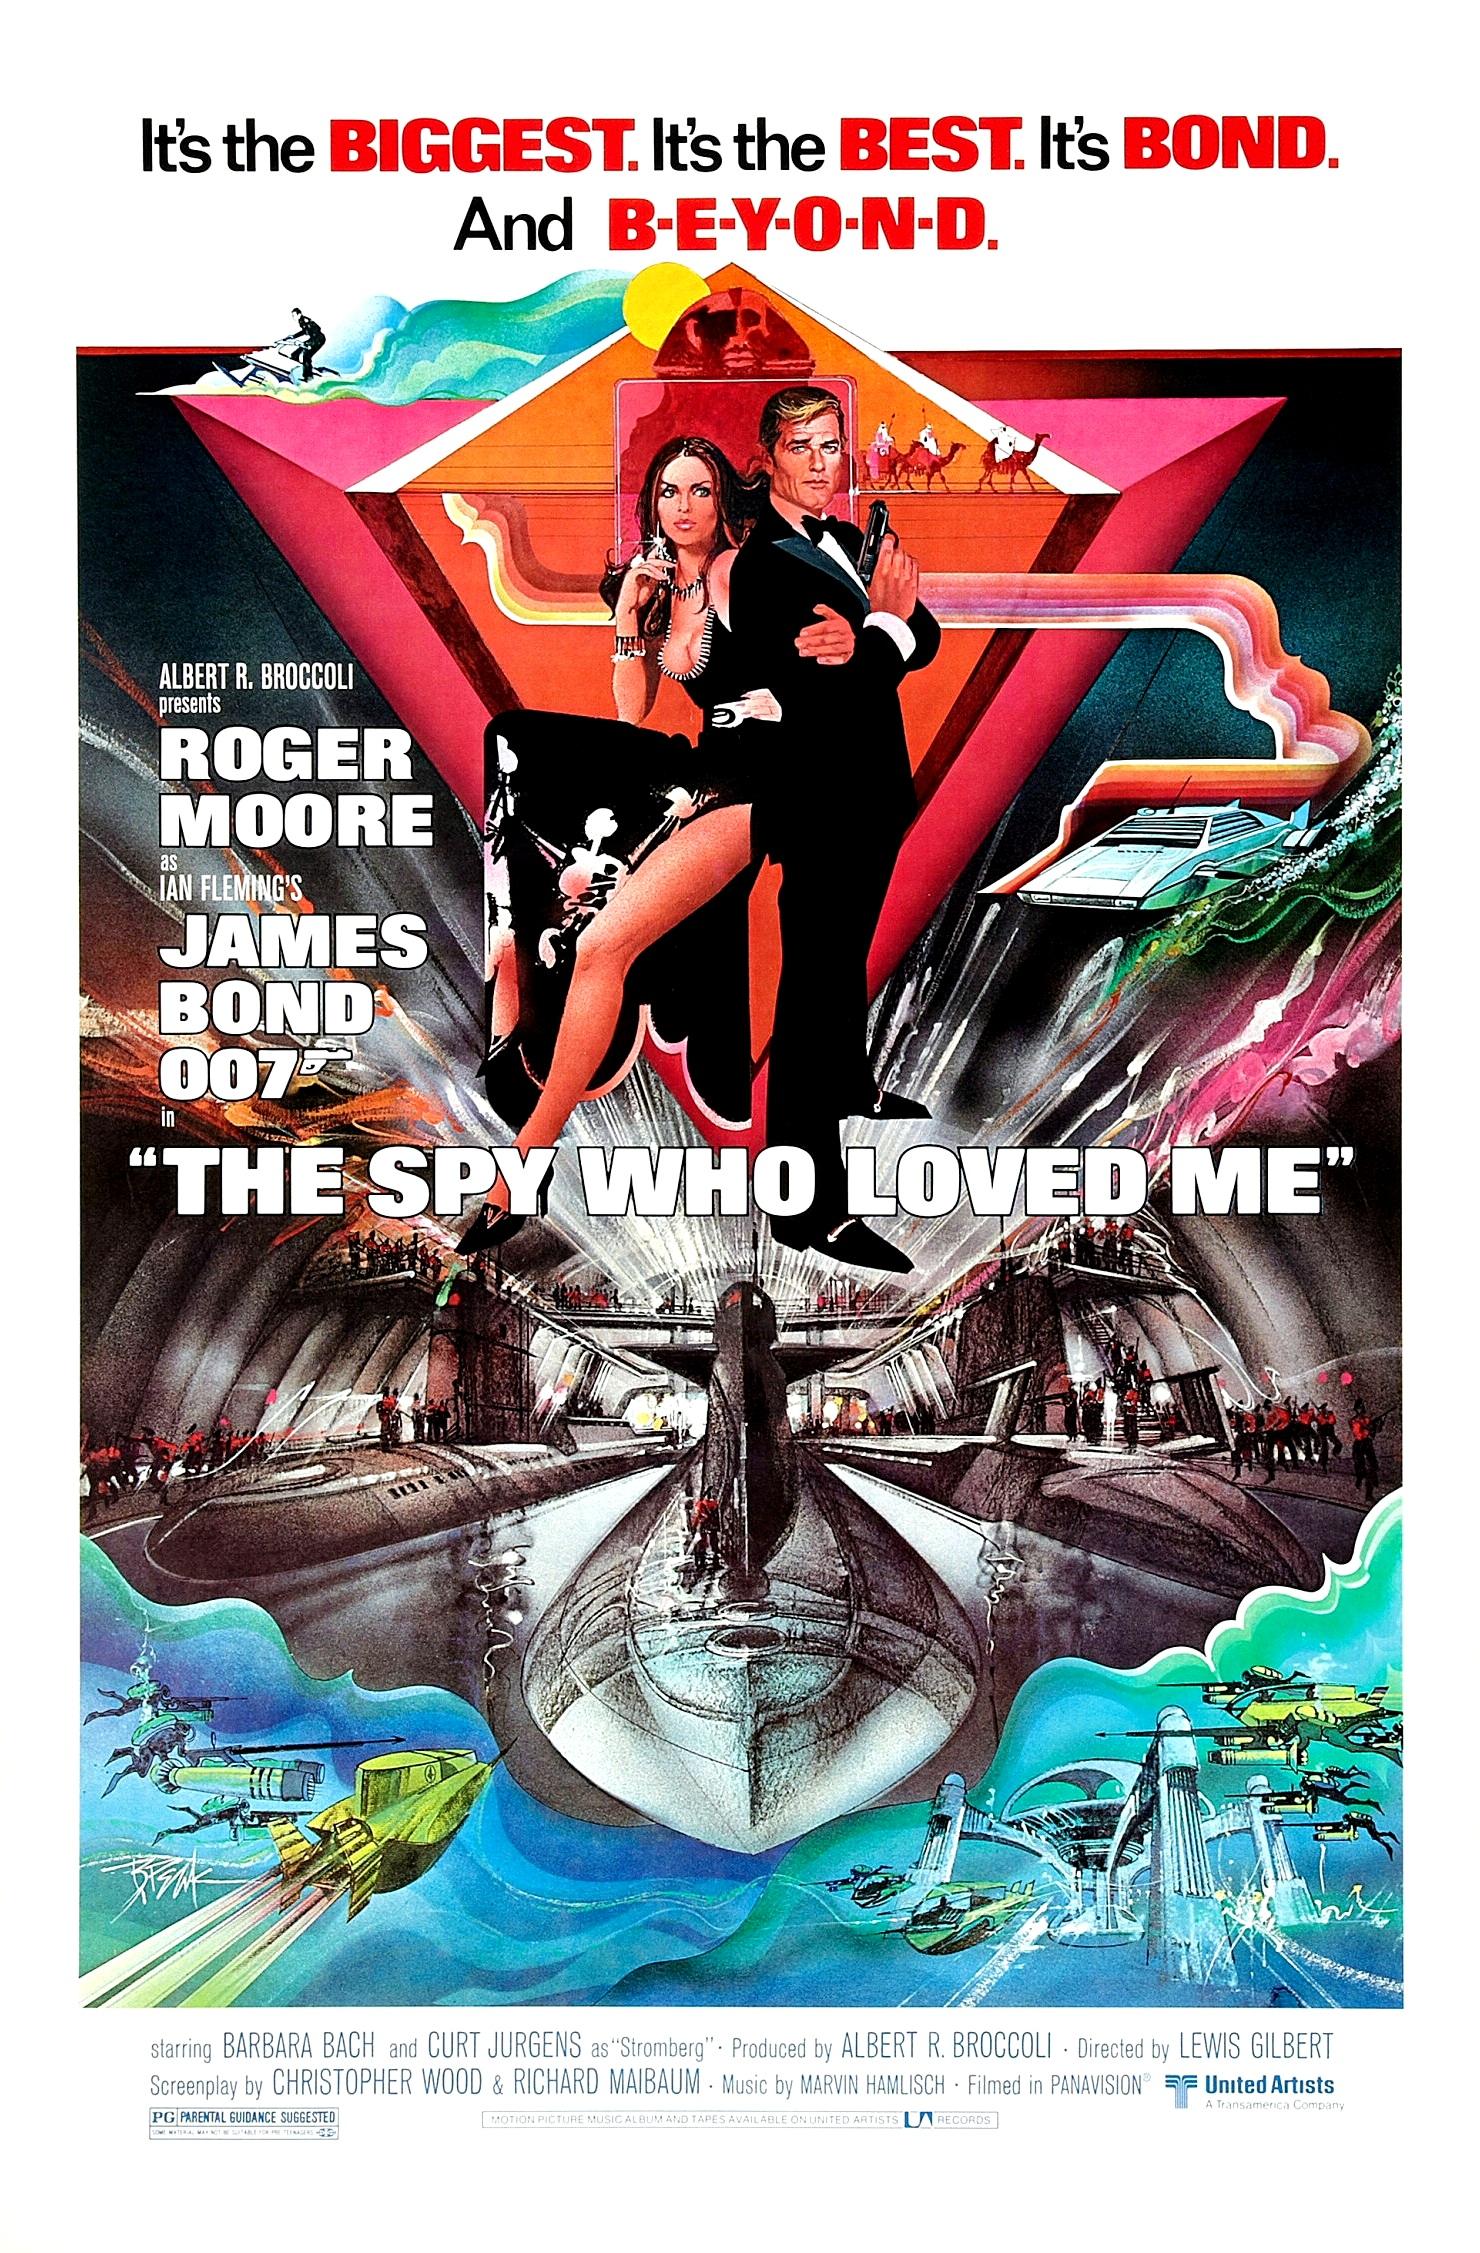 James Bond The Spy Who Loved Me Atlantis Rétro Film T SHIRT 007 cool